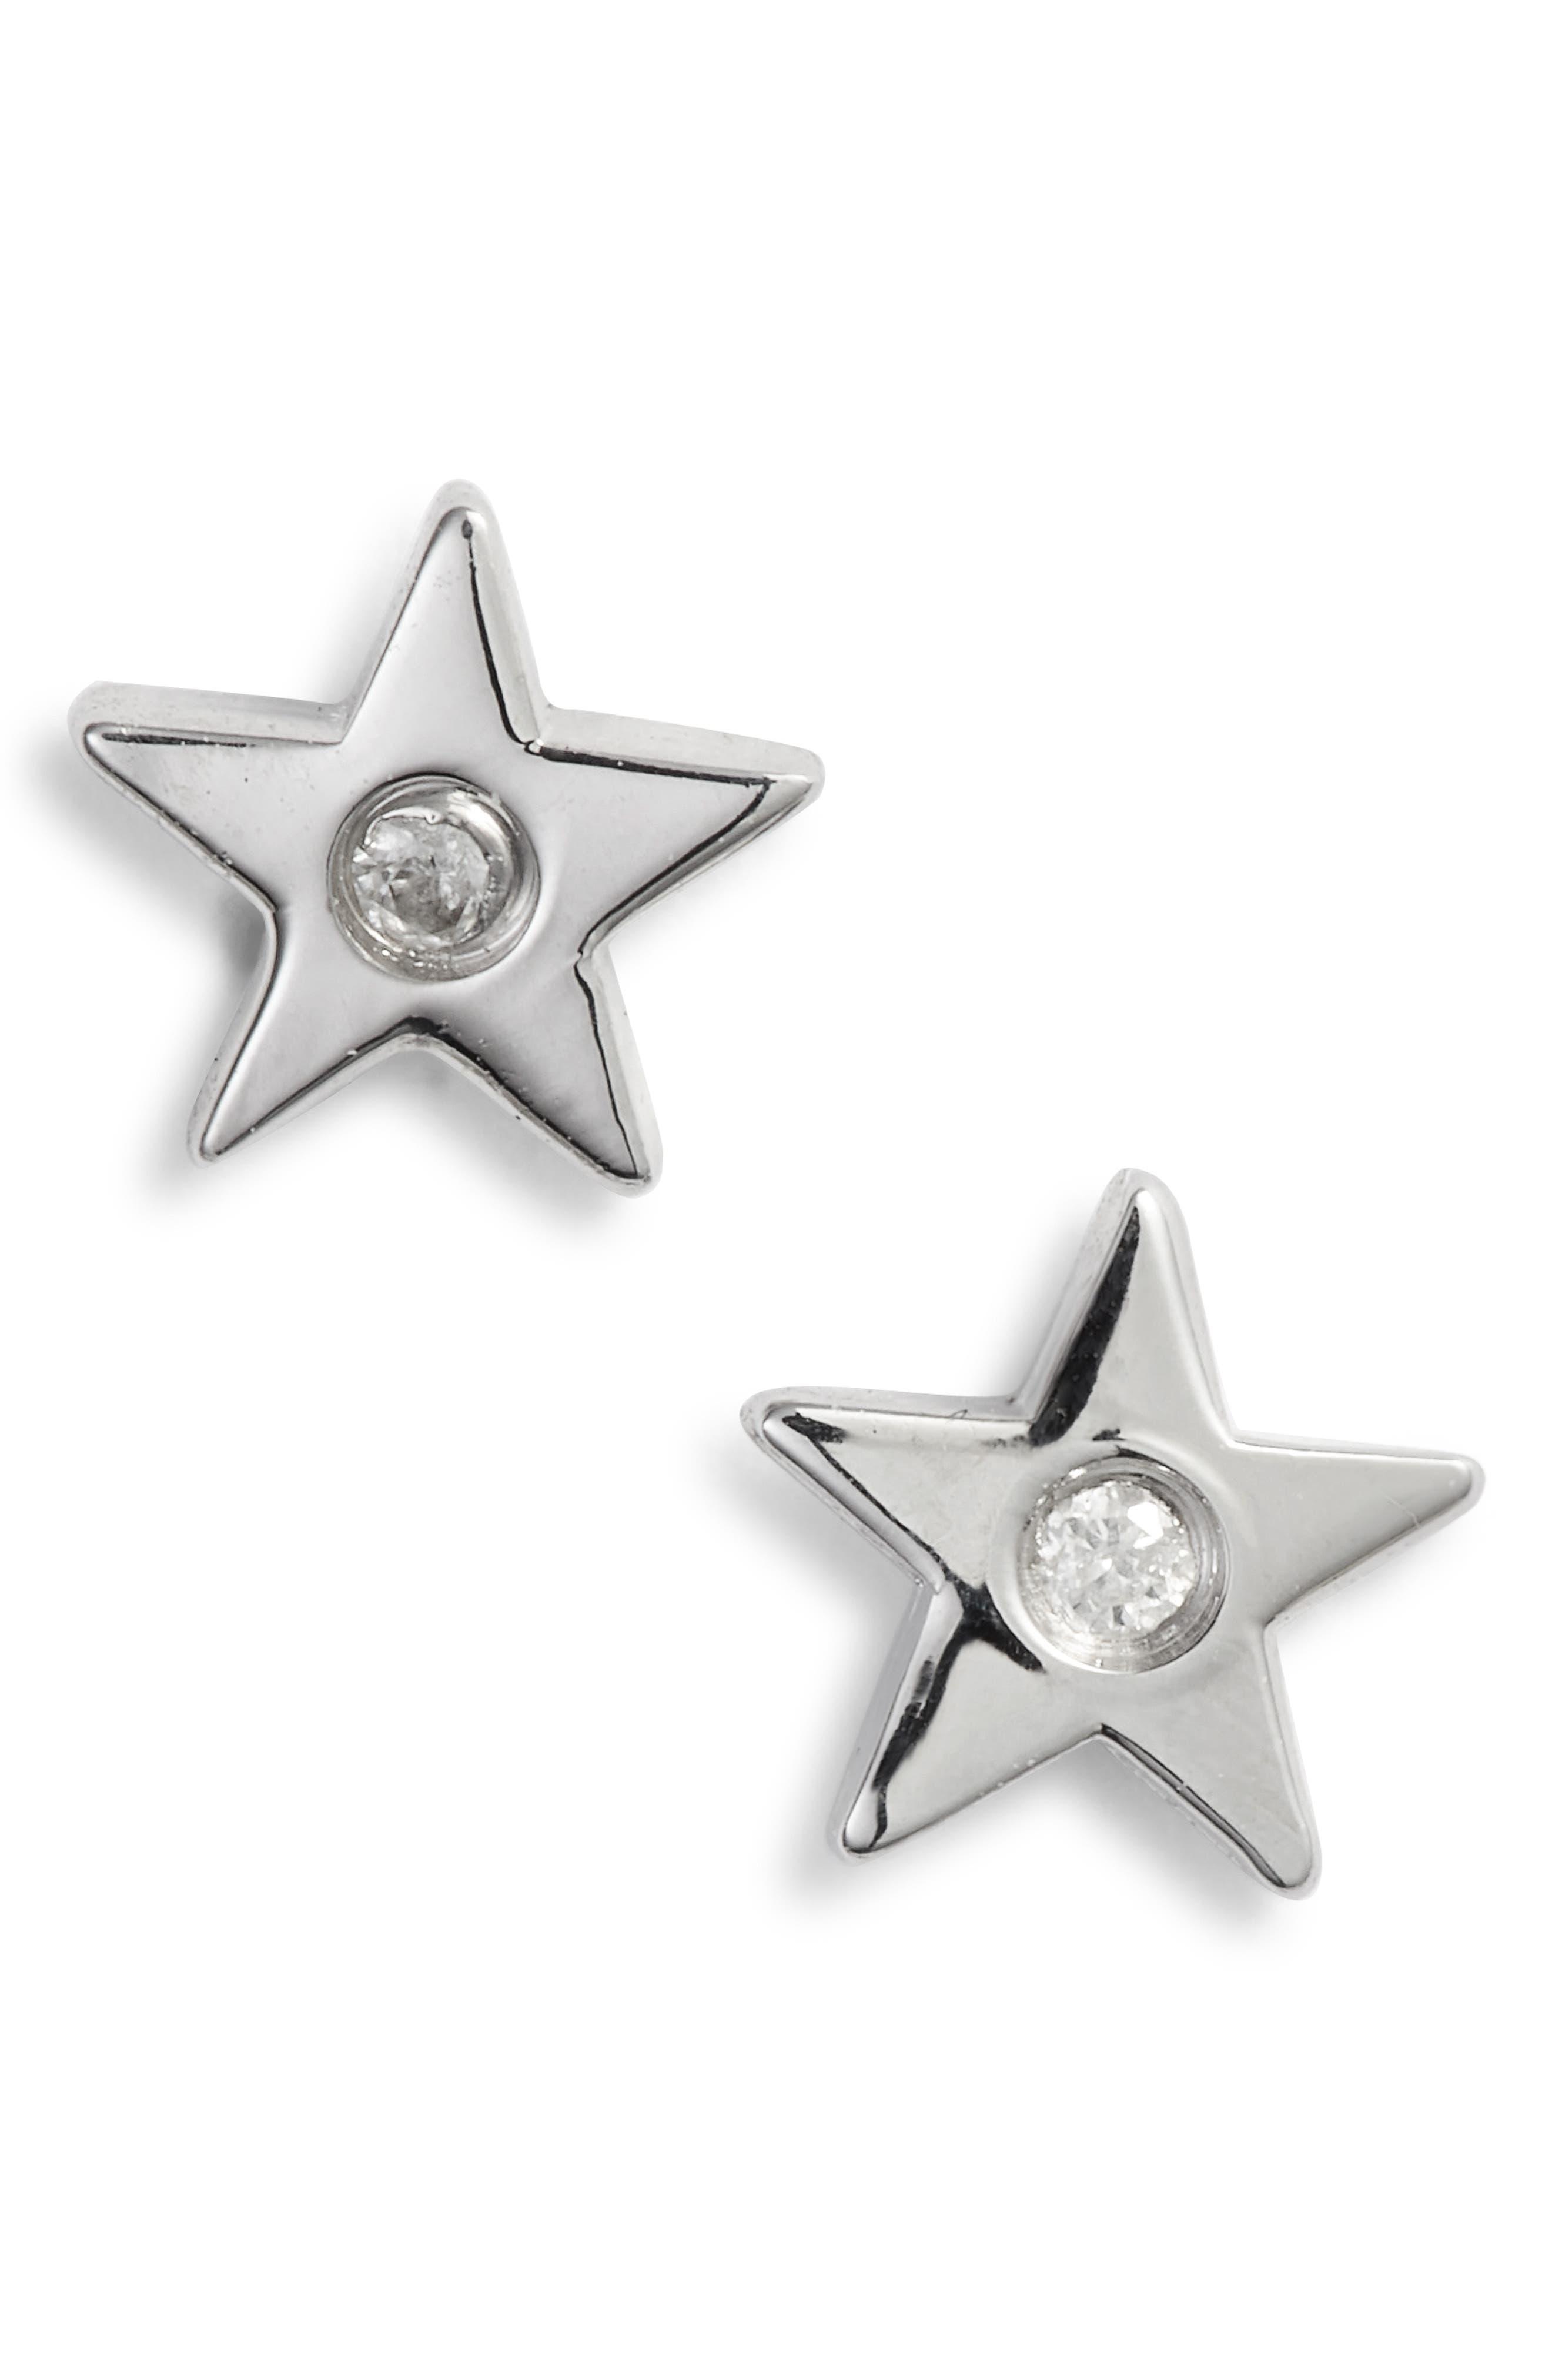 Star Stud Earrings,                             Alternate thumbnail 2, color,                             SILVER